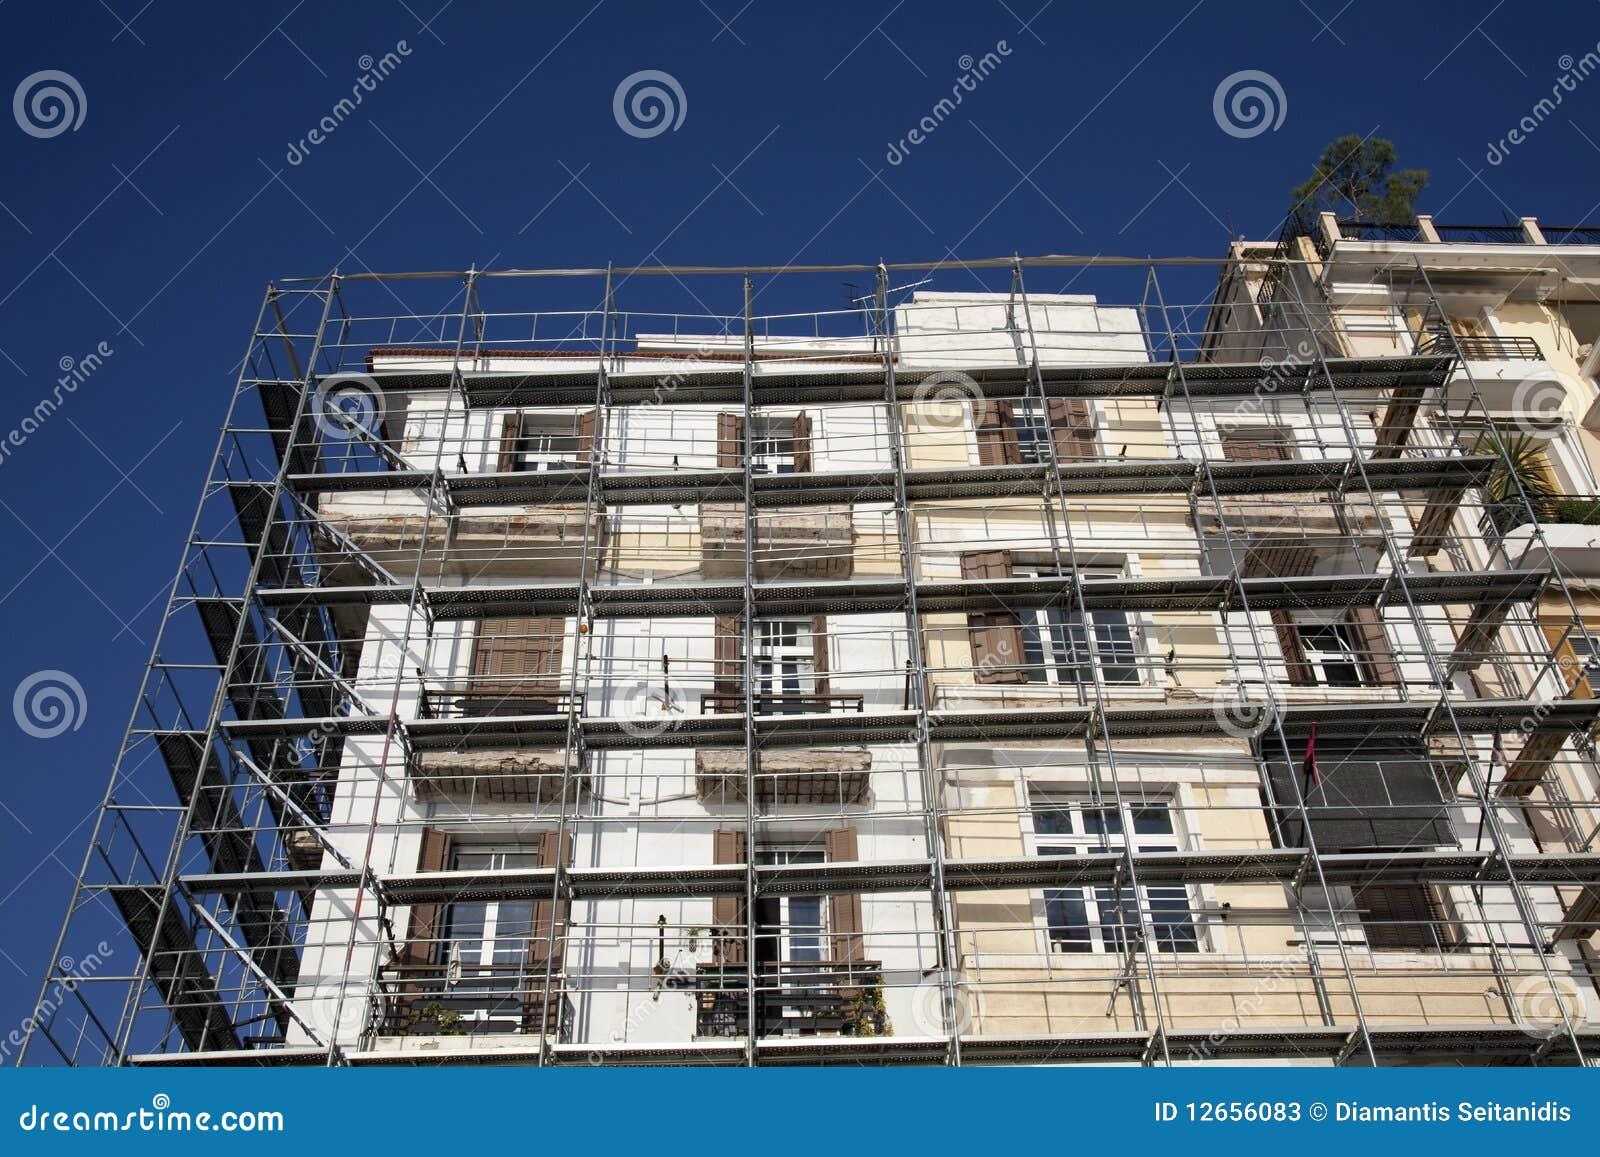 A Sample Property Maintenance & Renovation Business Plan Template